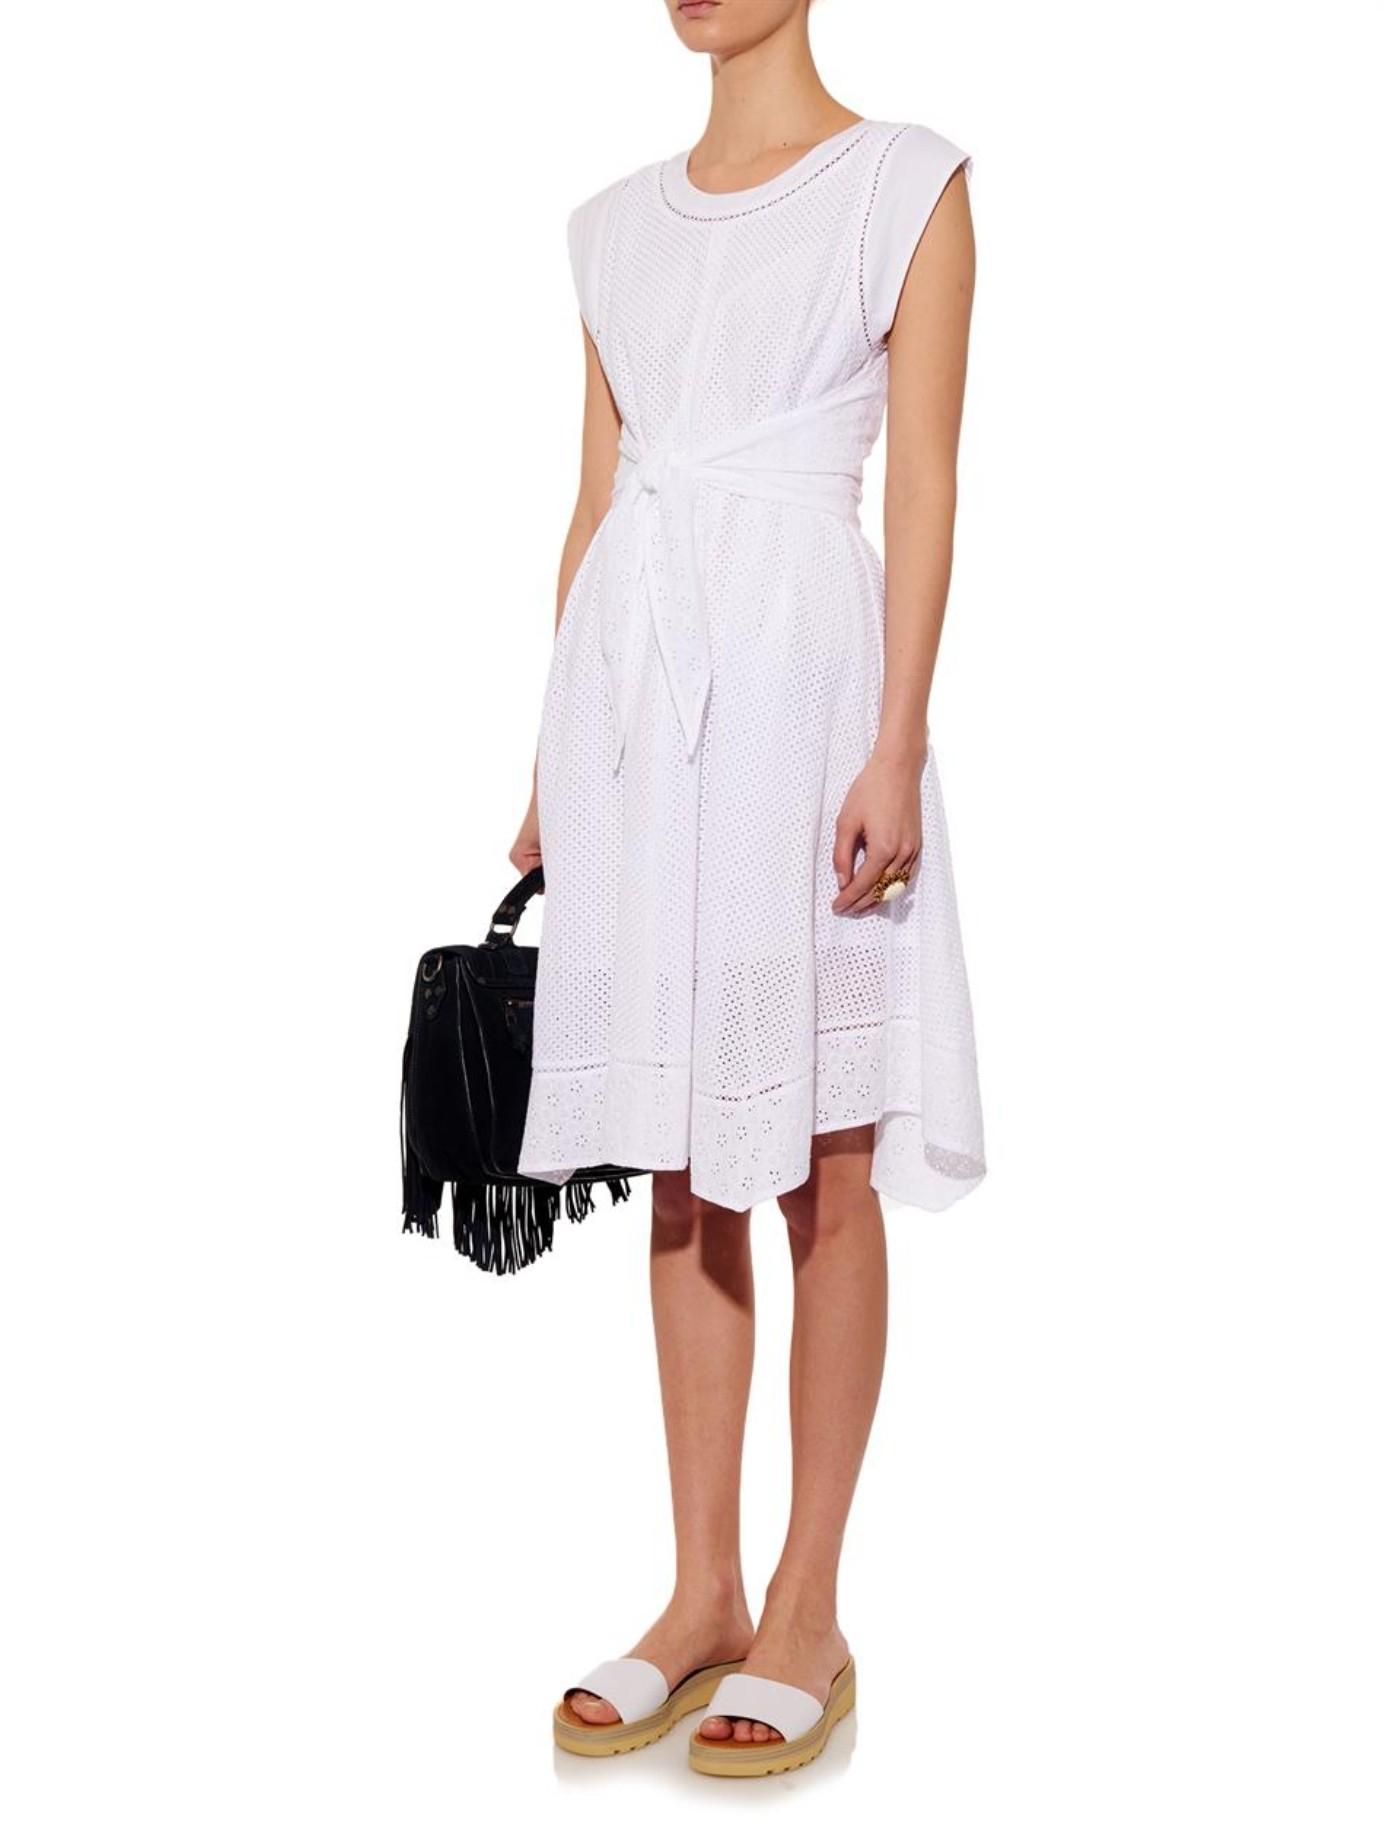 fb21522f121 Rebecca Taylor White Eyelet-detailed Cotton Dress